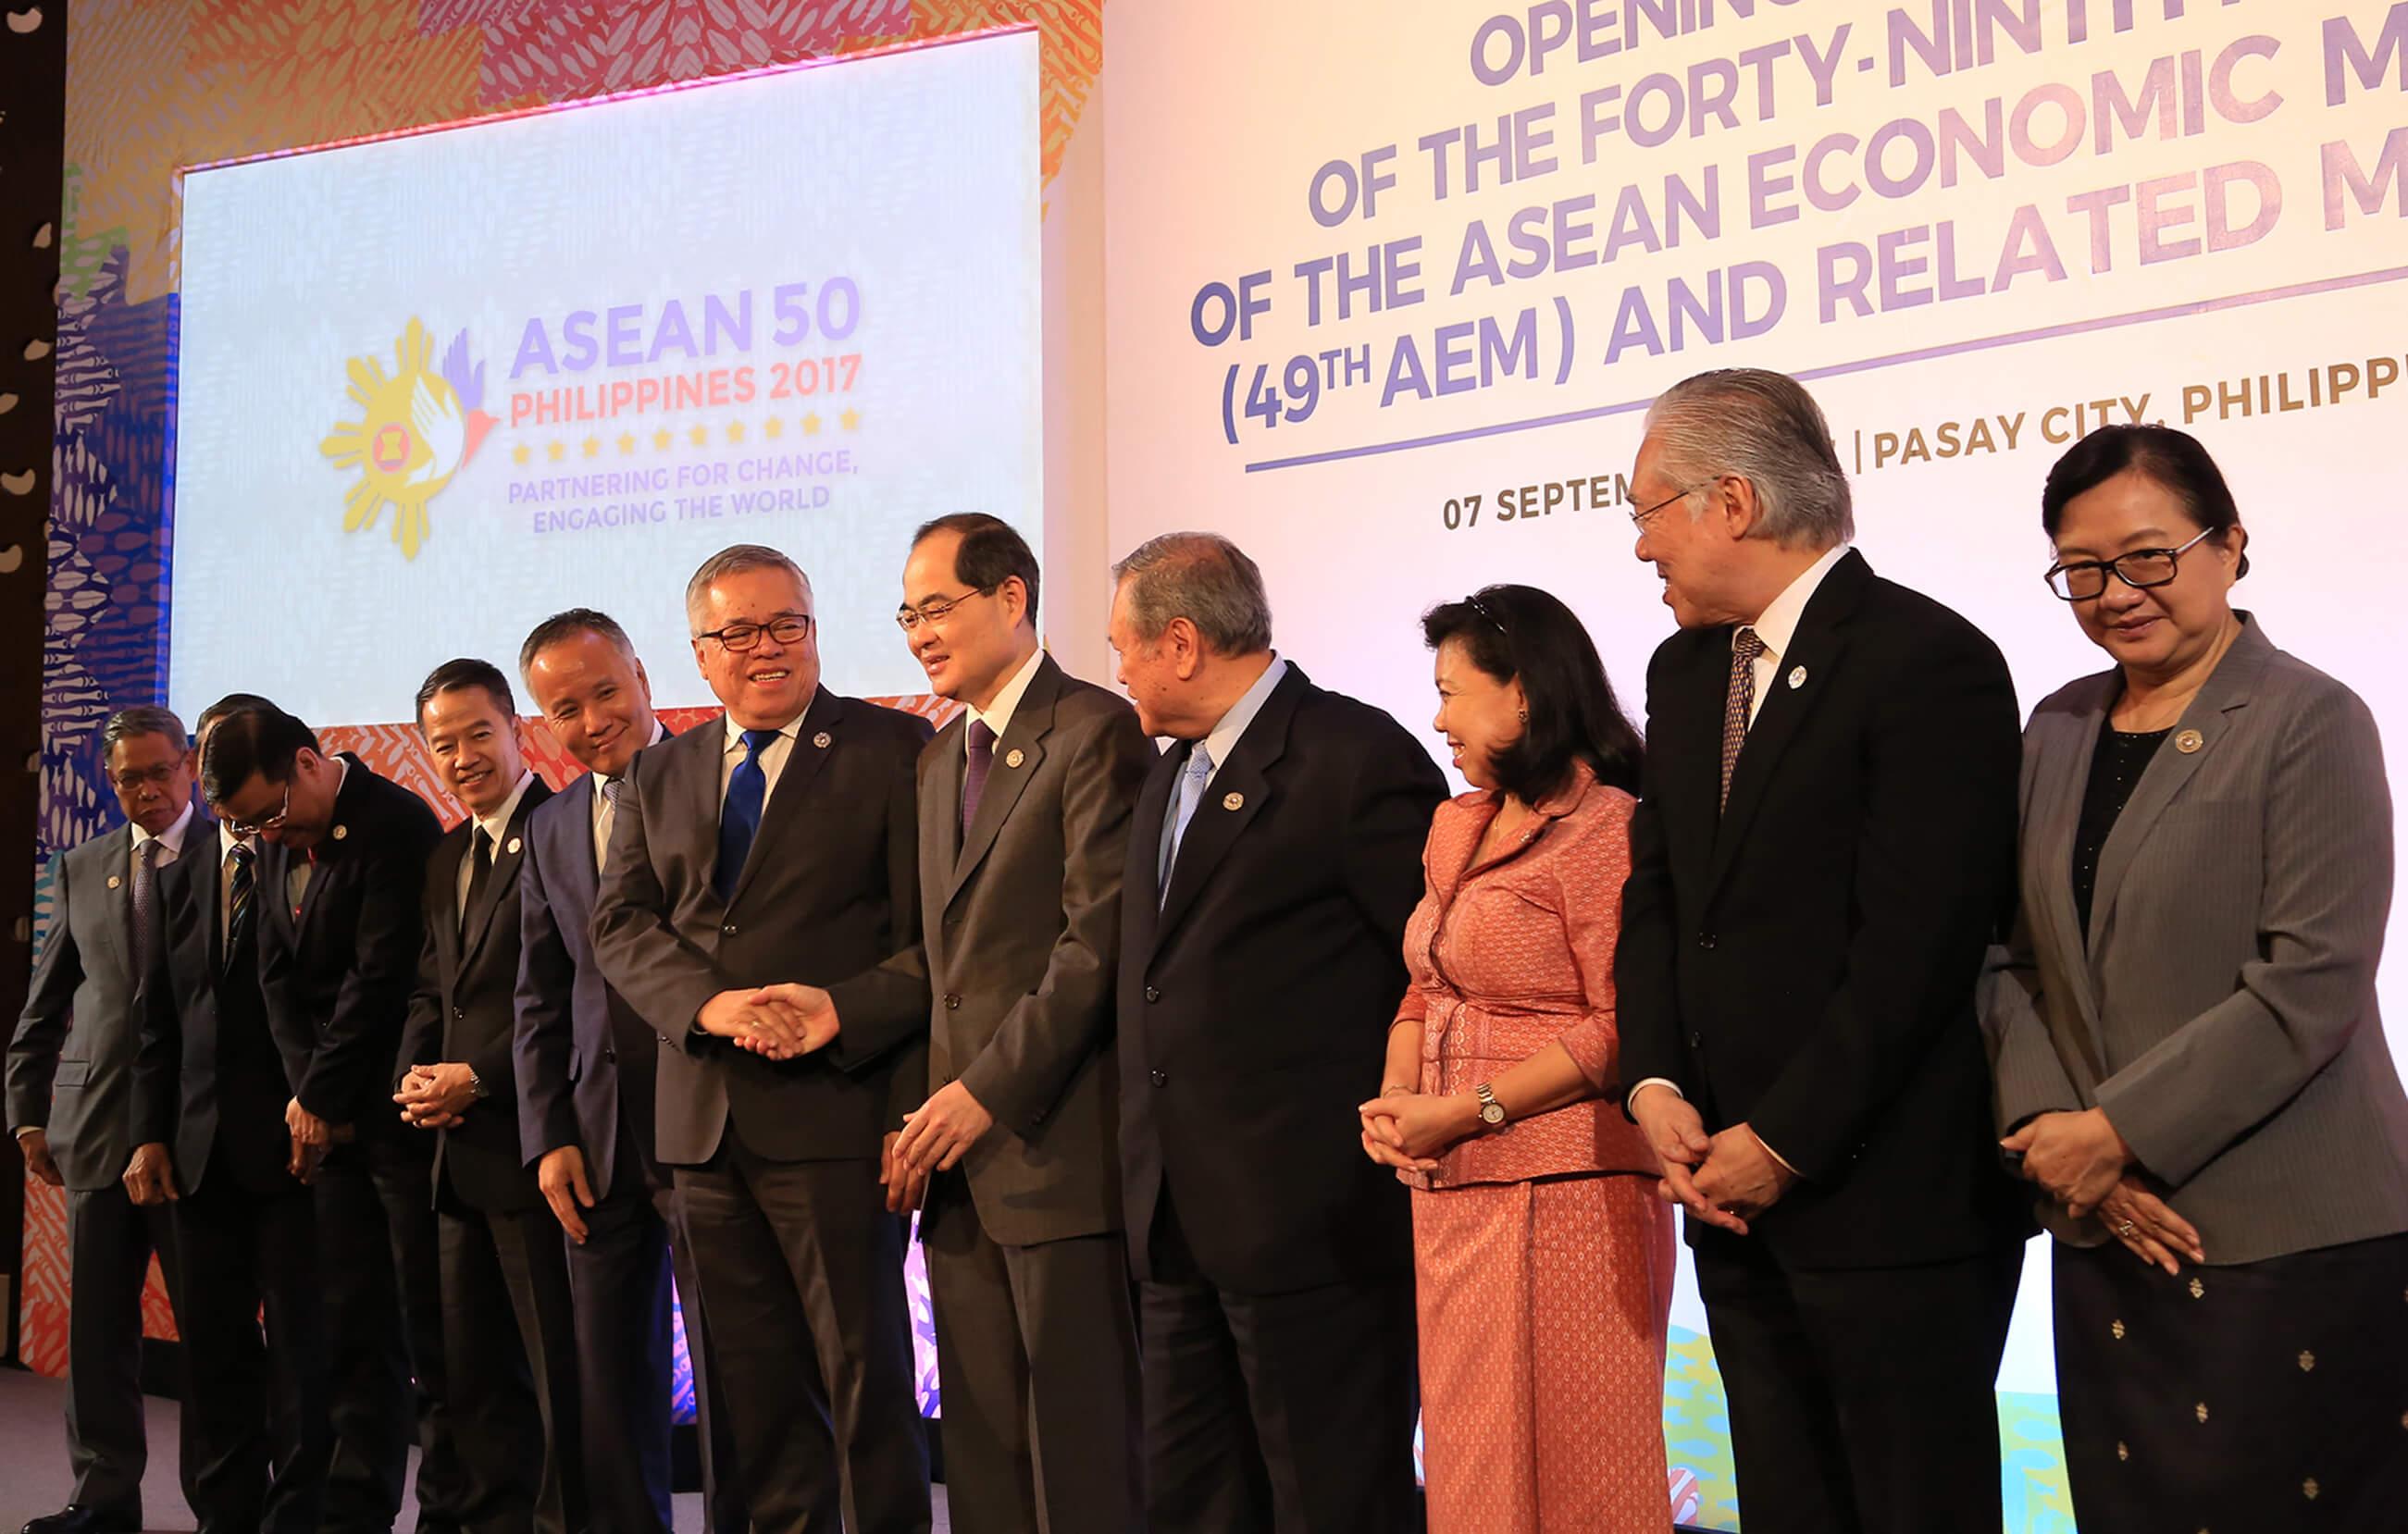 asean-economic-ministers-2017